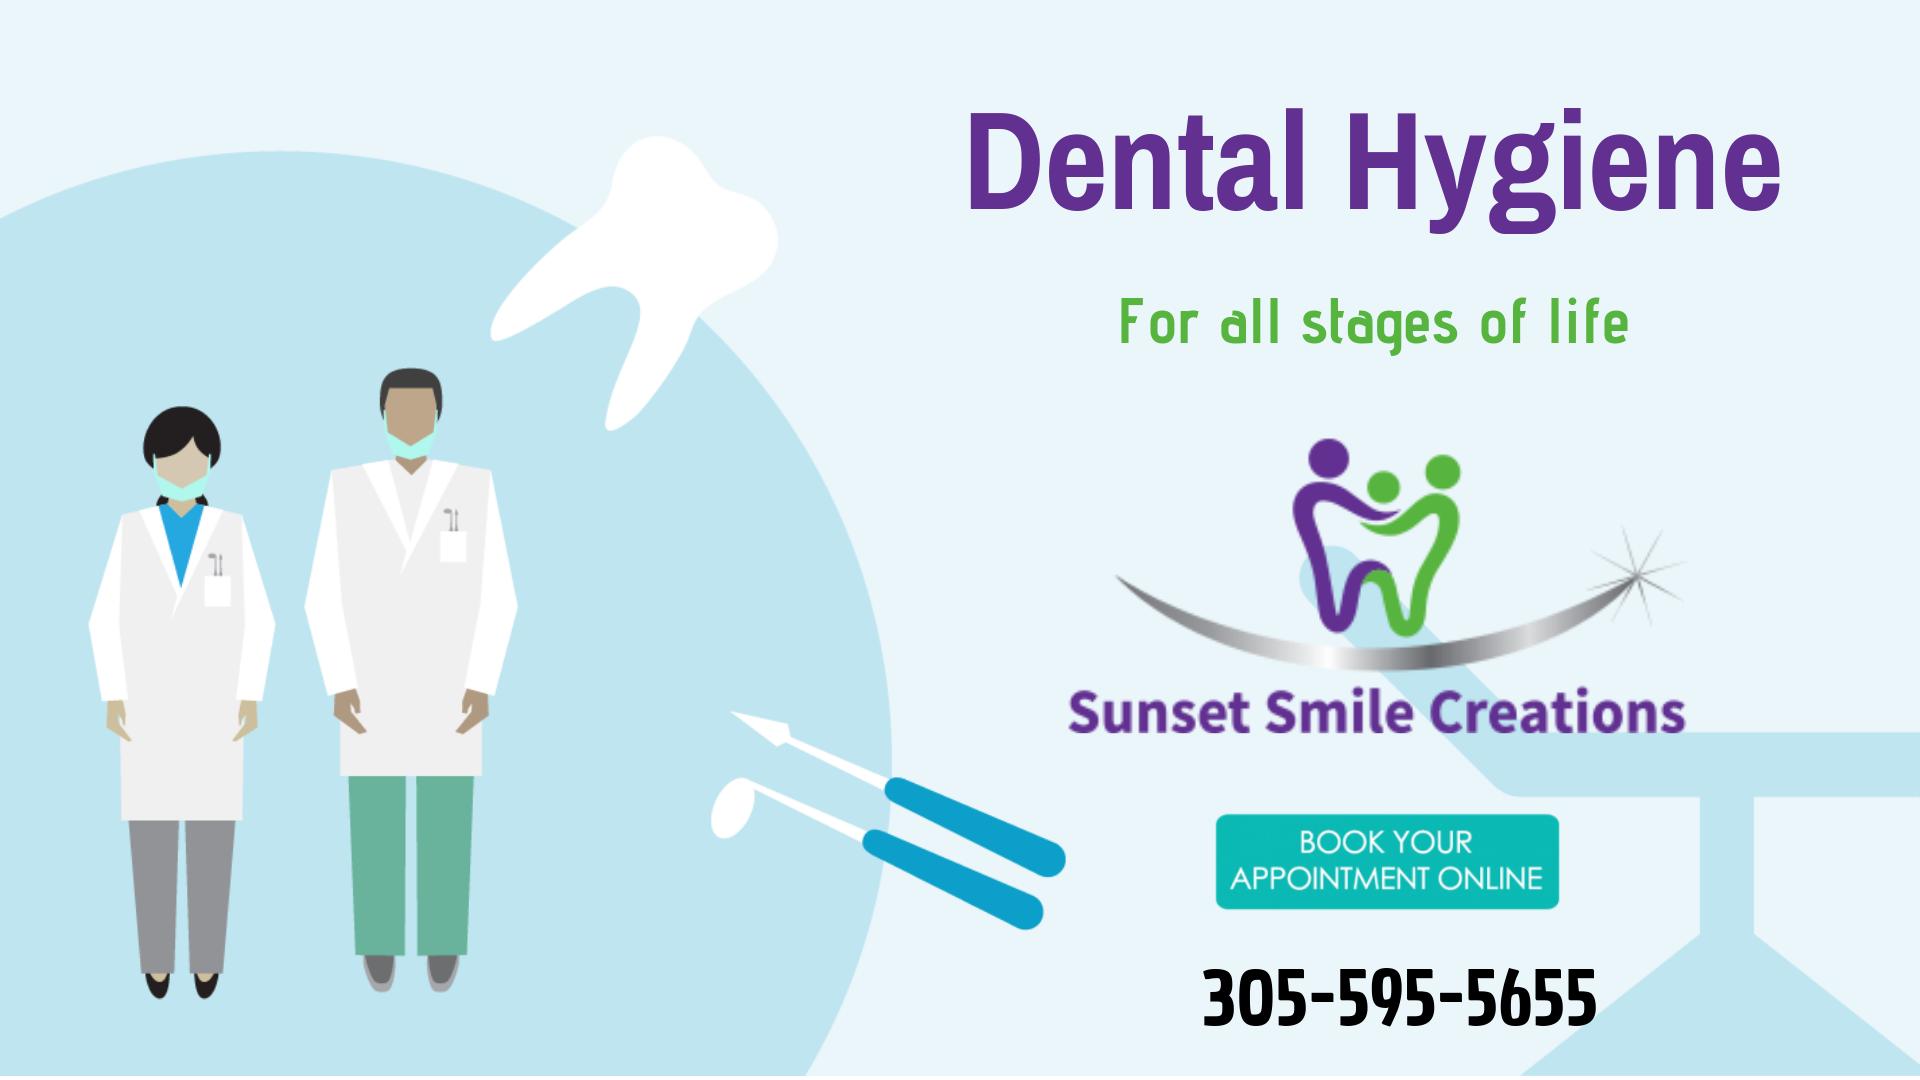 Premier and Hygienic Dental Clinic Family dental care